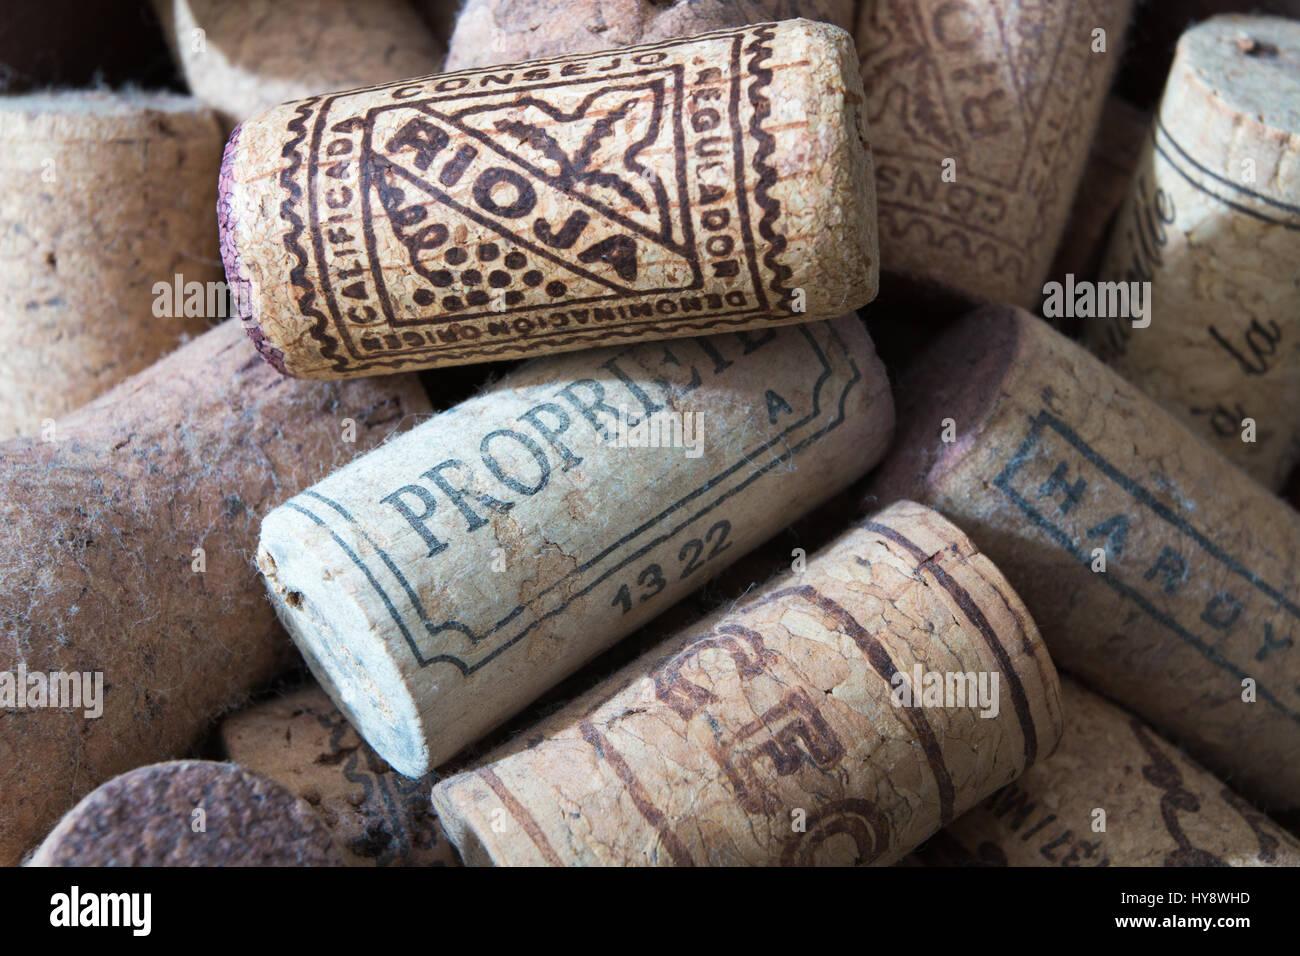 CORKS: Old corks from wine bottles - Stock Image